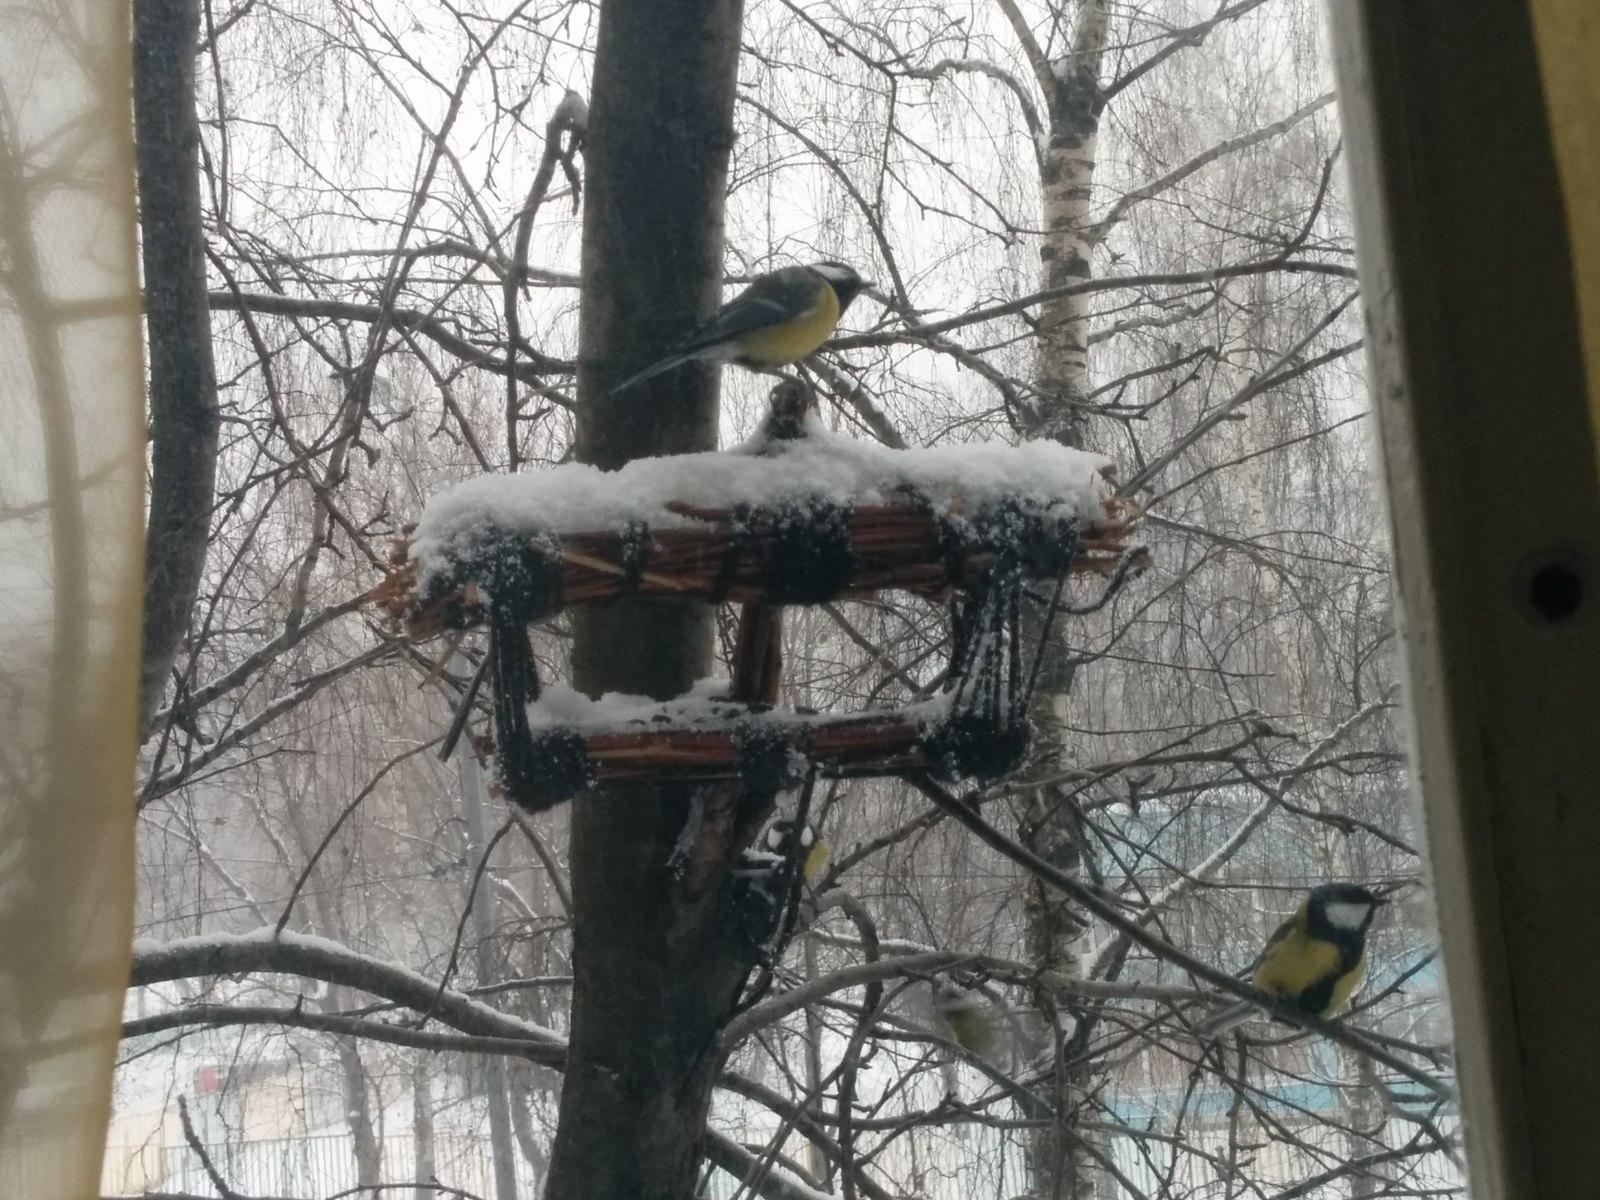 Кормушка птиц за окно своими руками фото 316